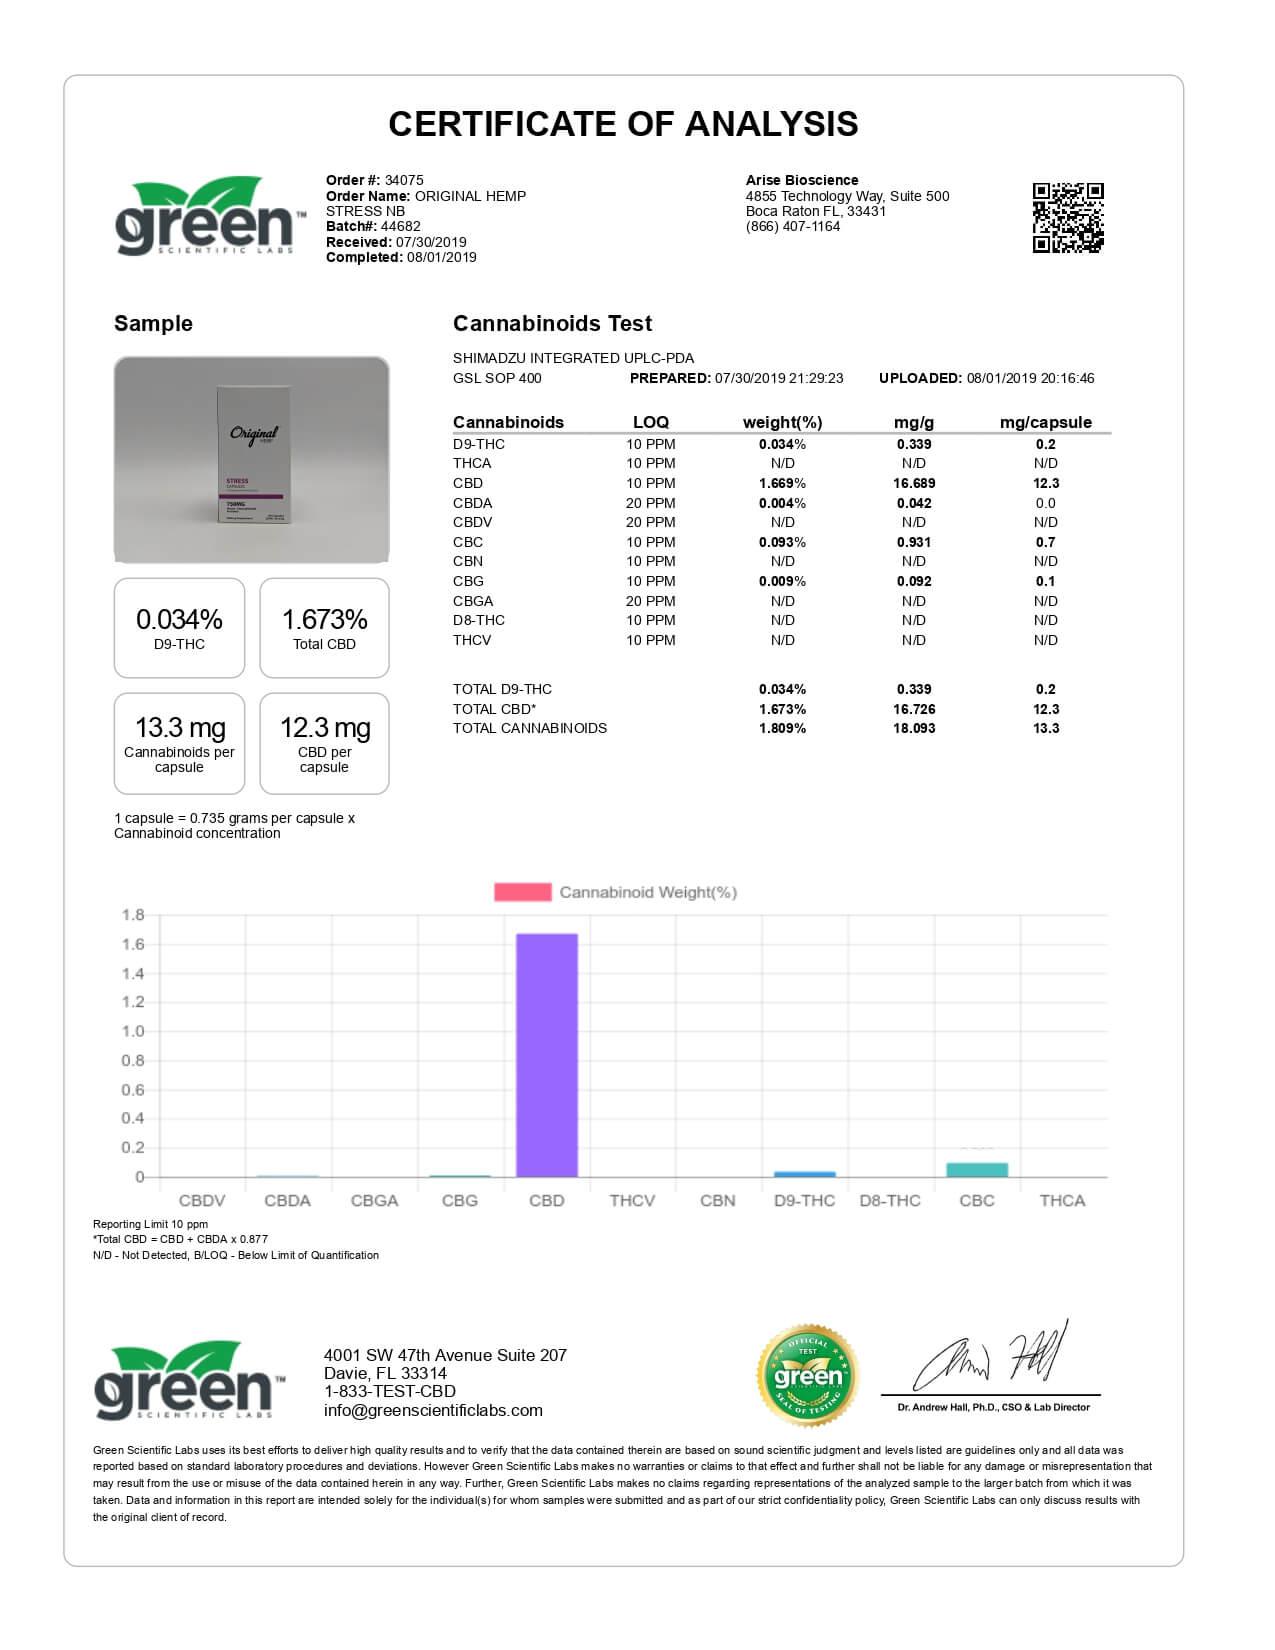 Original Hemp CBD Capsule Stress 750mg Lab Report